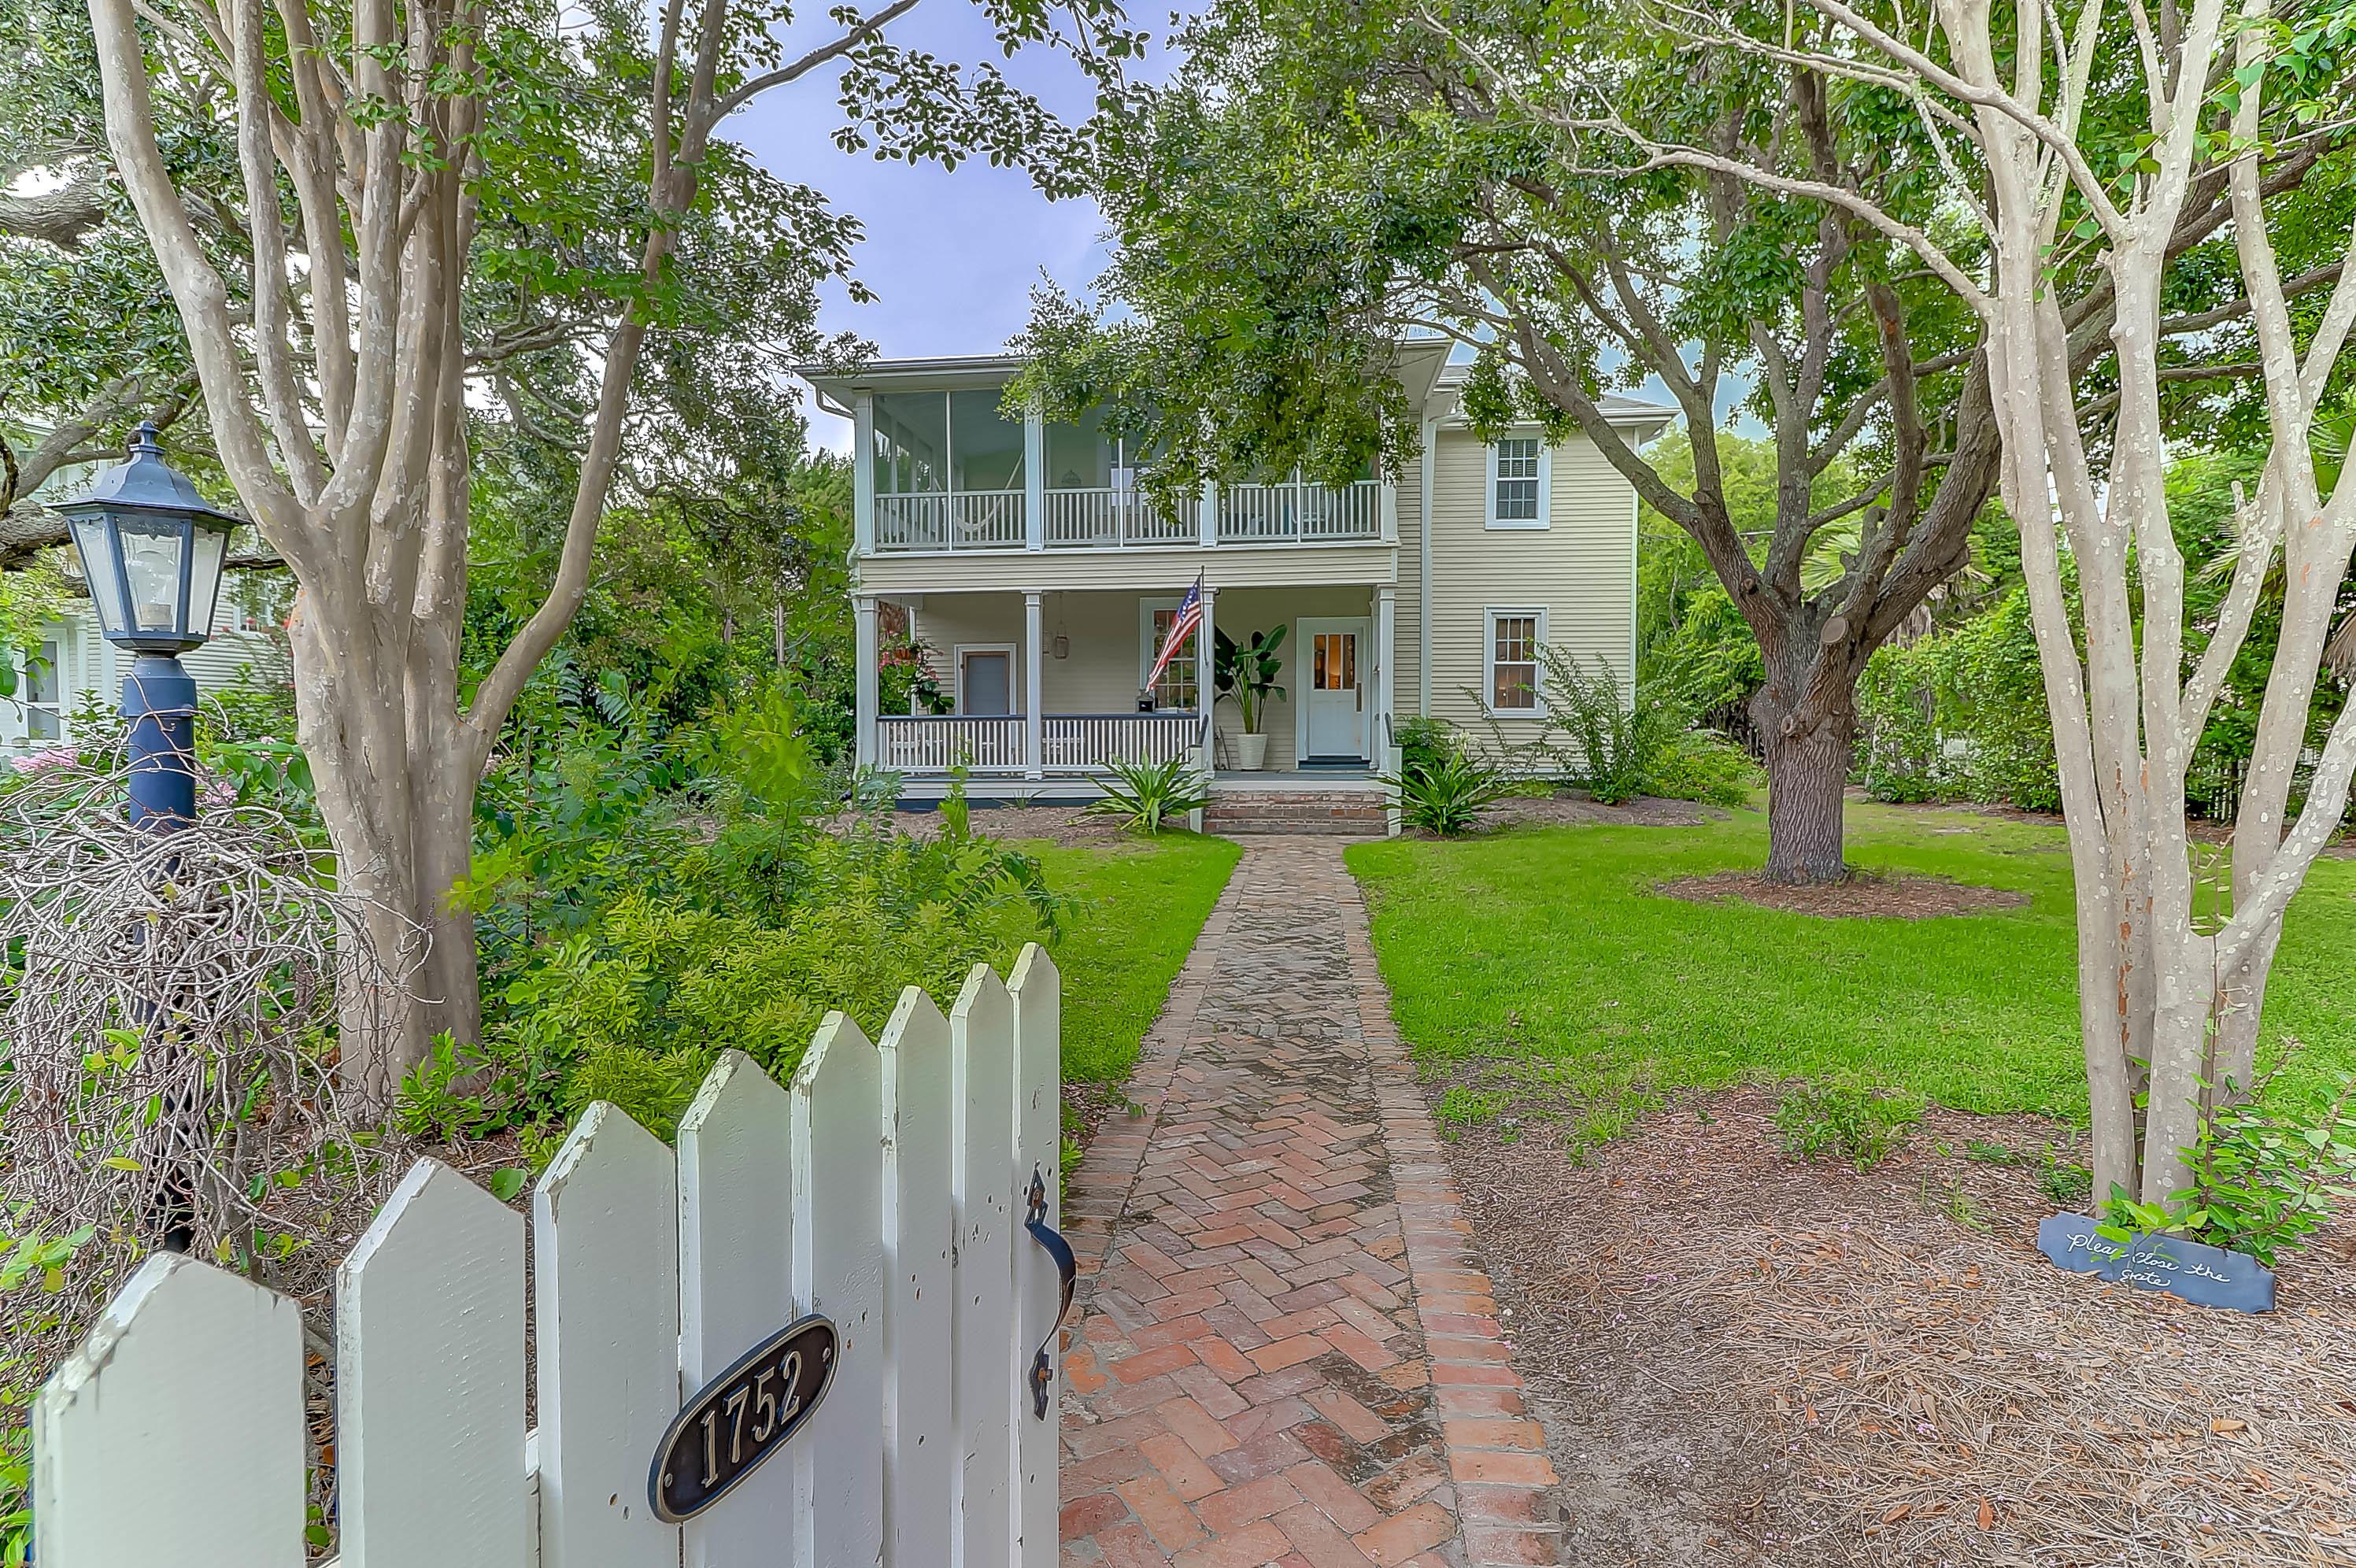 Photo of 1752 Central Ave, Sullivan's Island, SC 29482